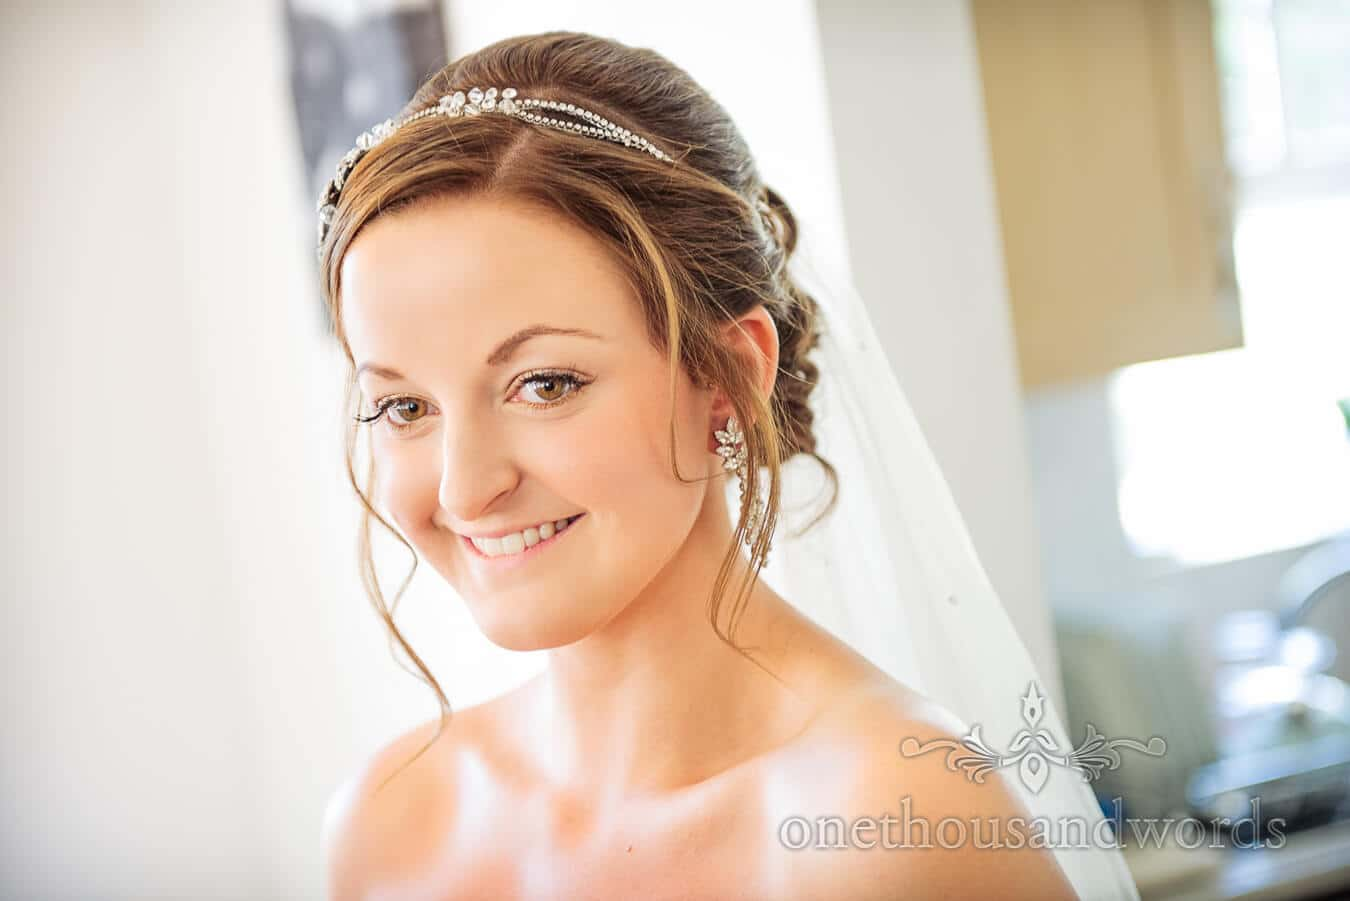 Bride prepares on wedding morning for wedding at Poole wedding venue